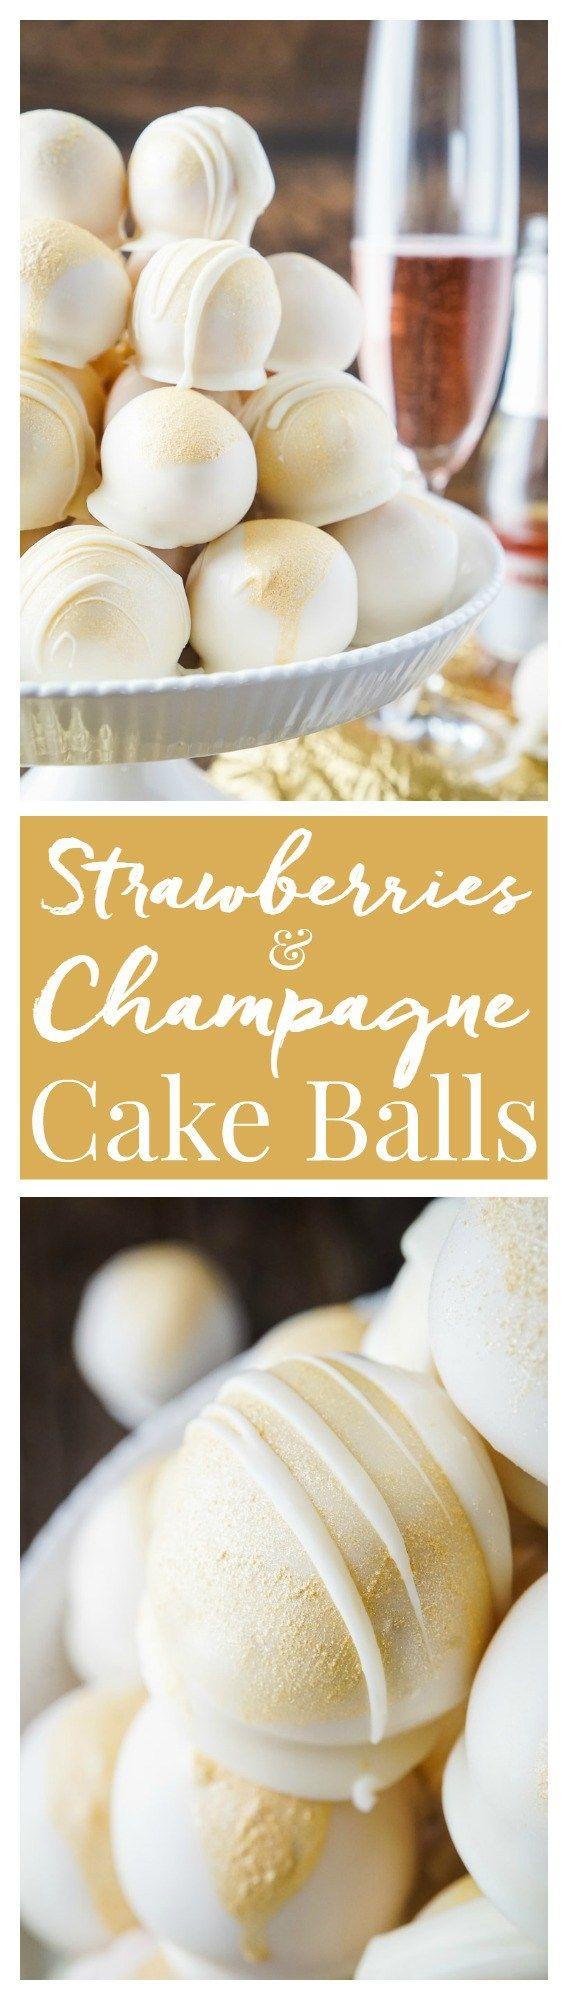 Strawberries & Champagne Cake Balls (strawberry triffle food)